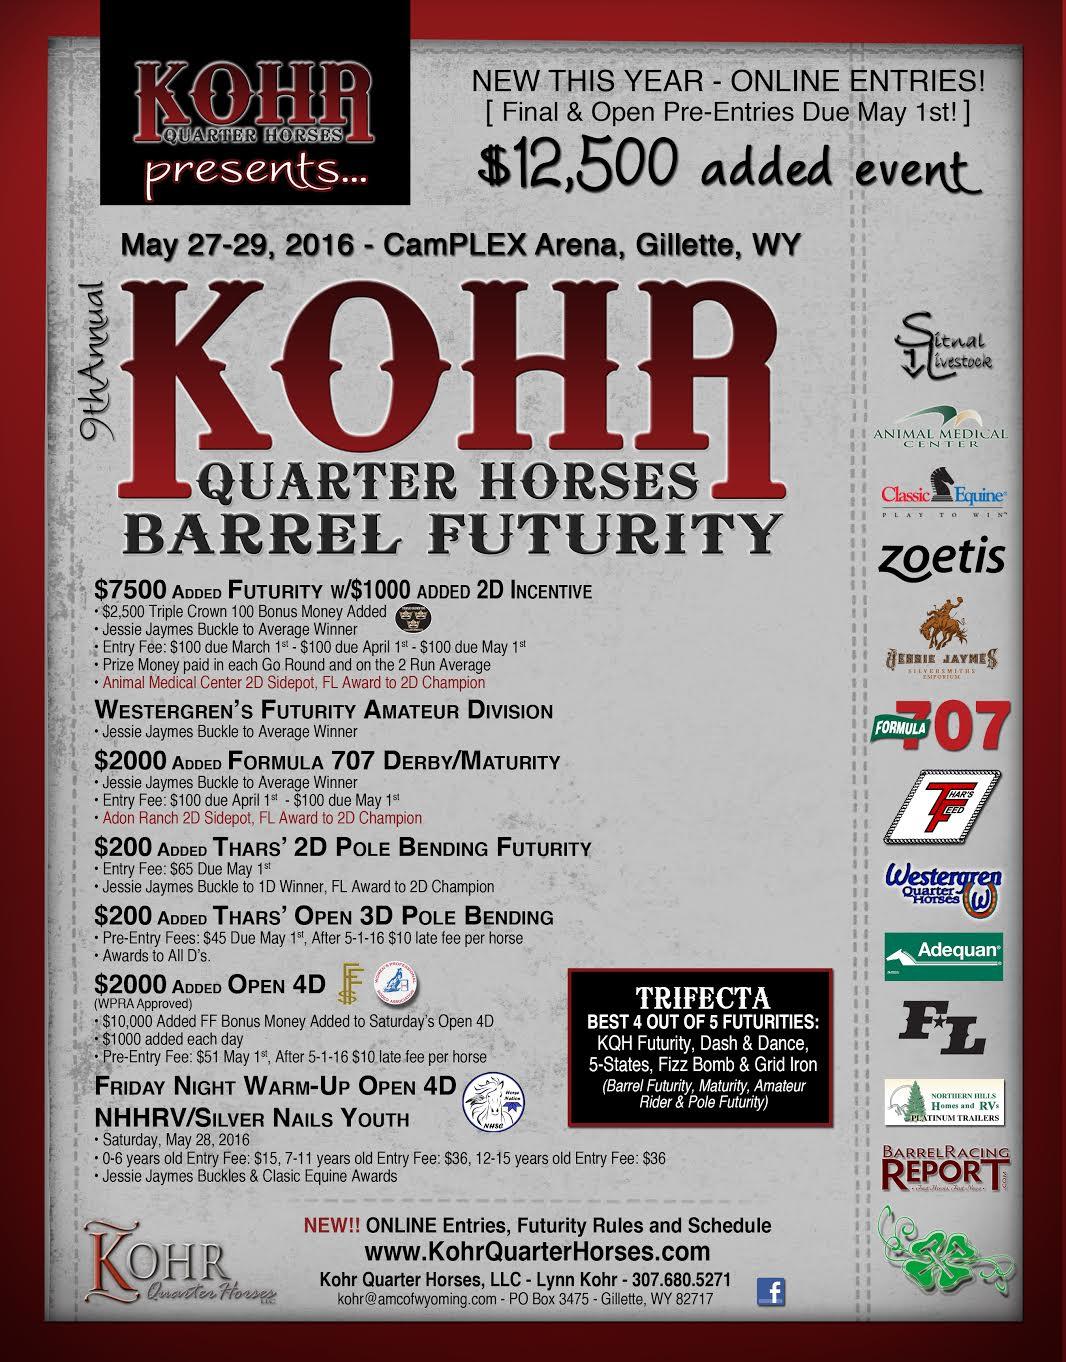 barrel racing futurity, Kohr Quarter Horses